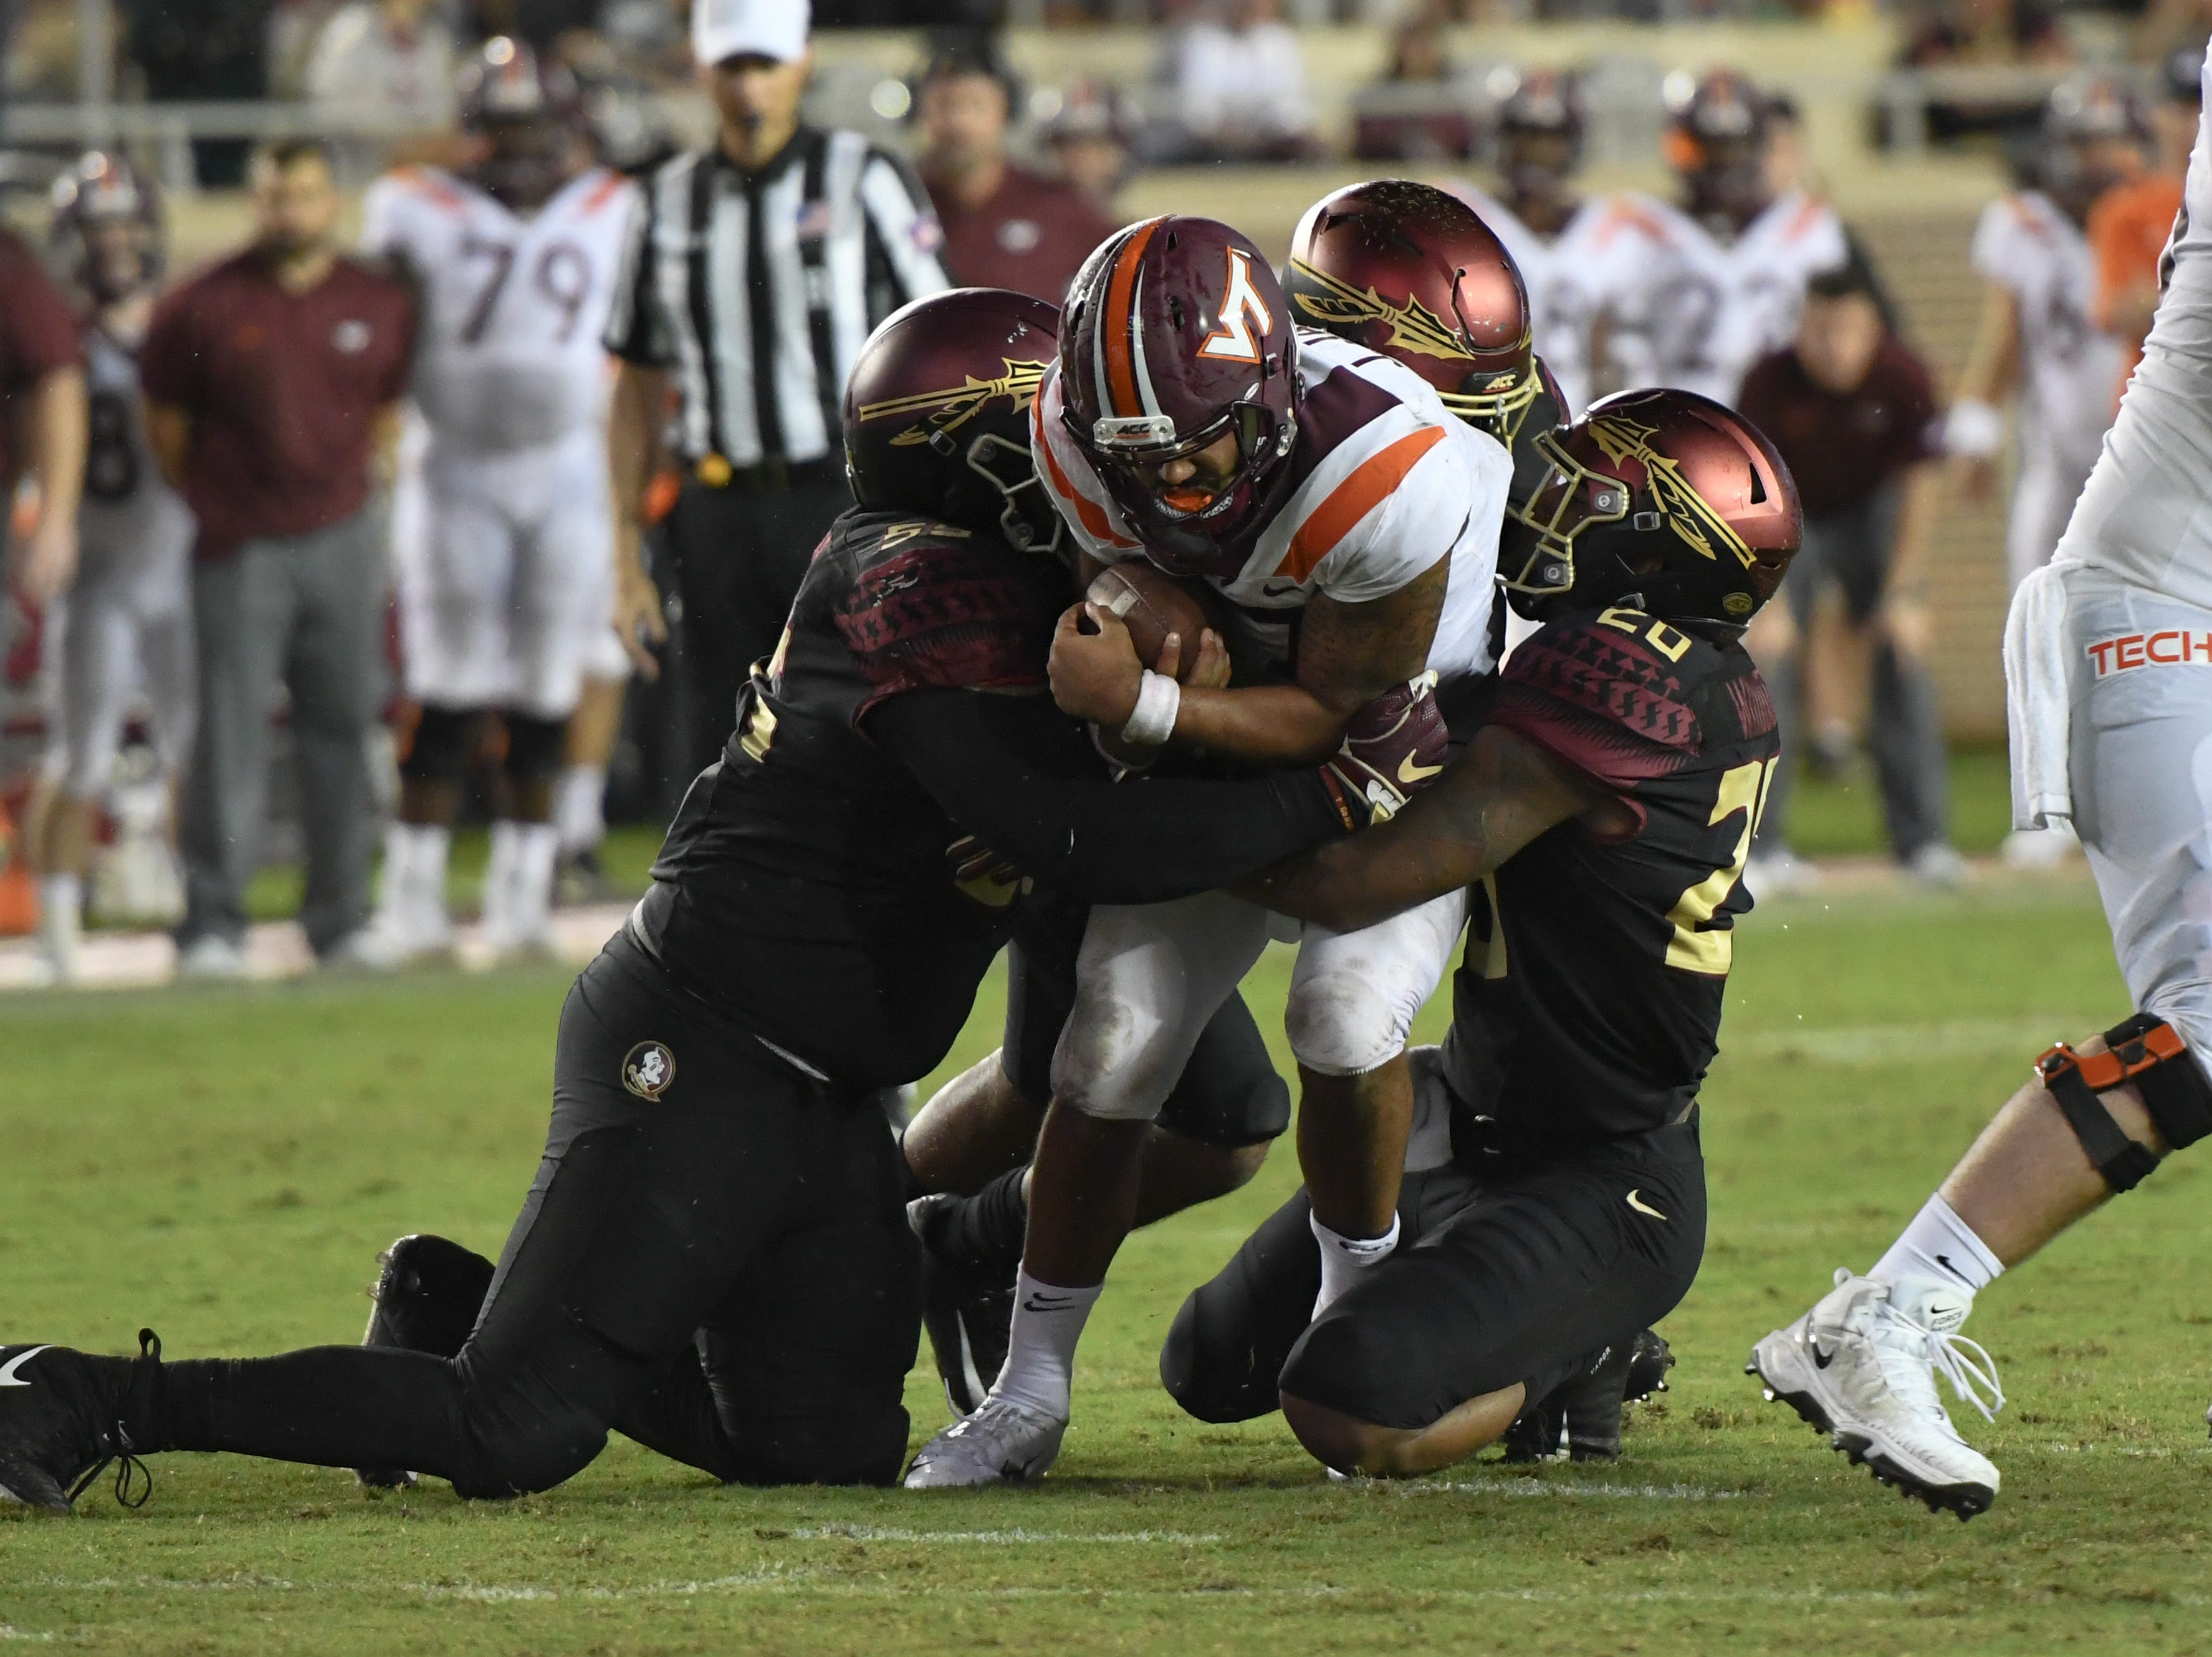 A couple of FSU defenders sacking Virginia Tech's quarterback during the third quarter of FSU's game against Virginia Tech on Monday night.